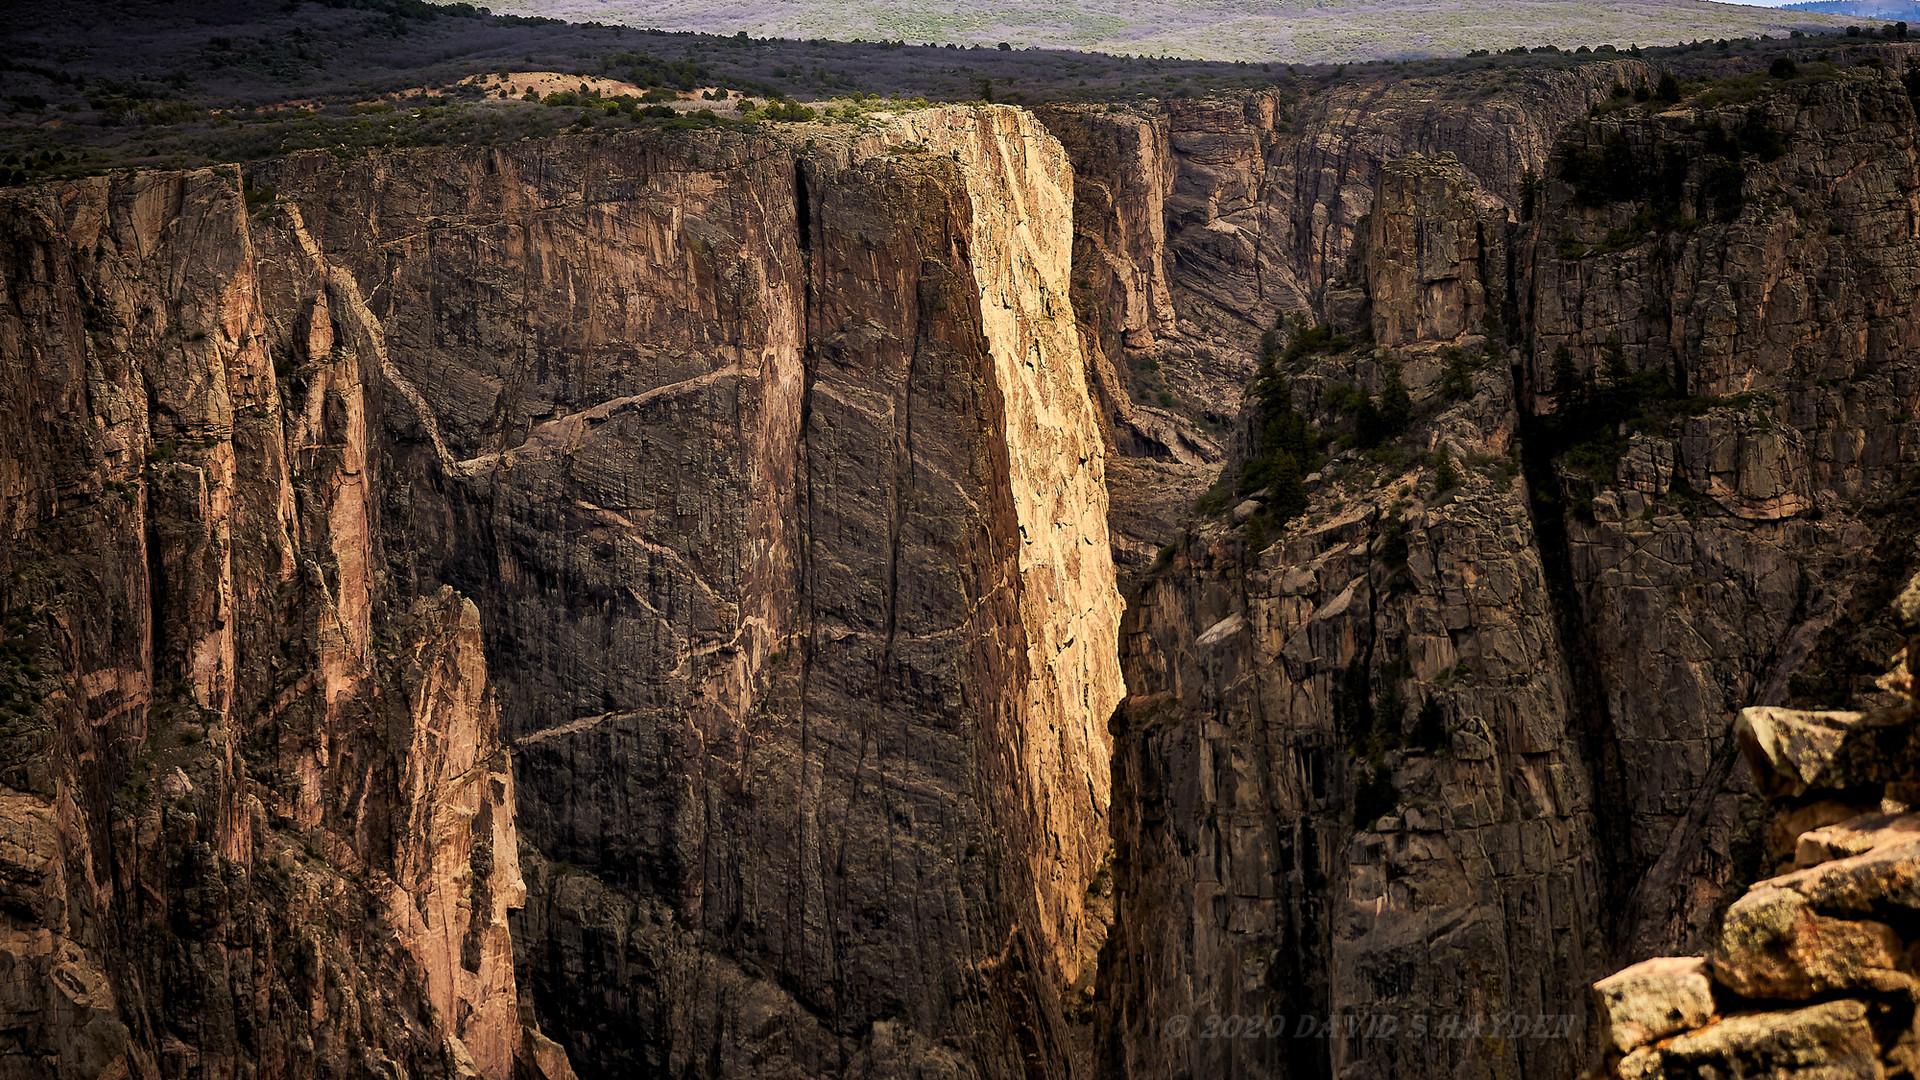 Black_Canyon_5533_©_2020_David_S_Hayden.